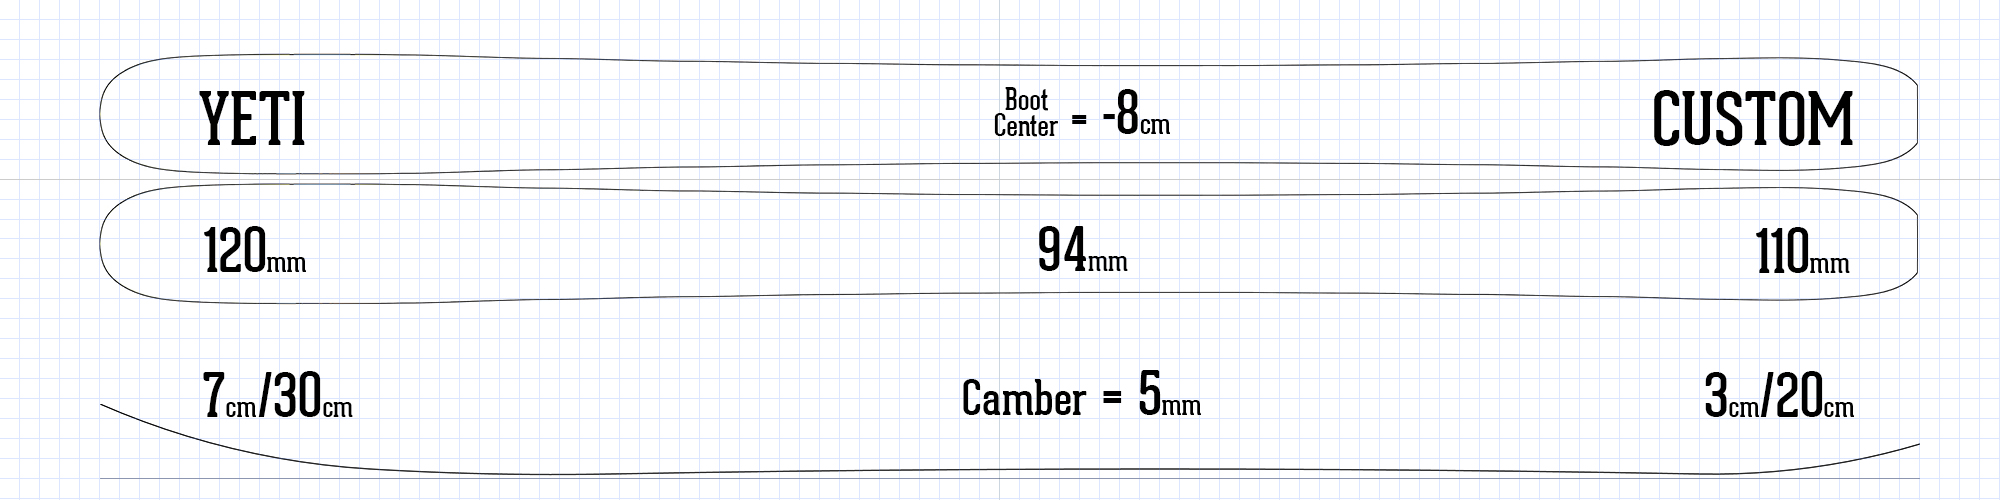 Yeti ski information rocker camber profile specs